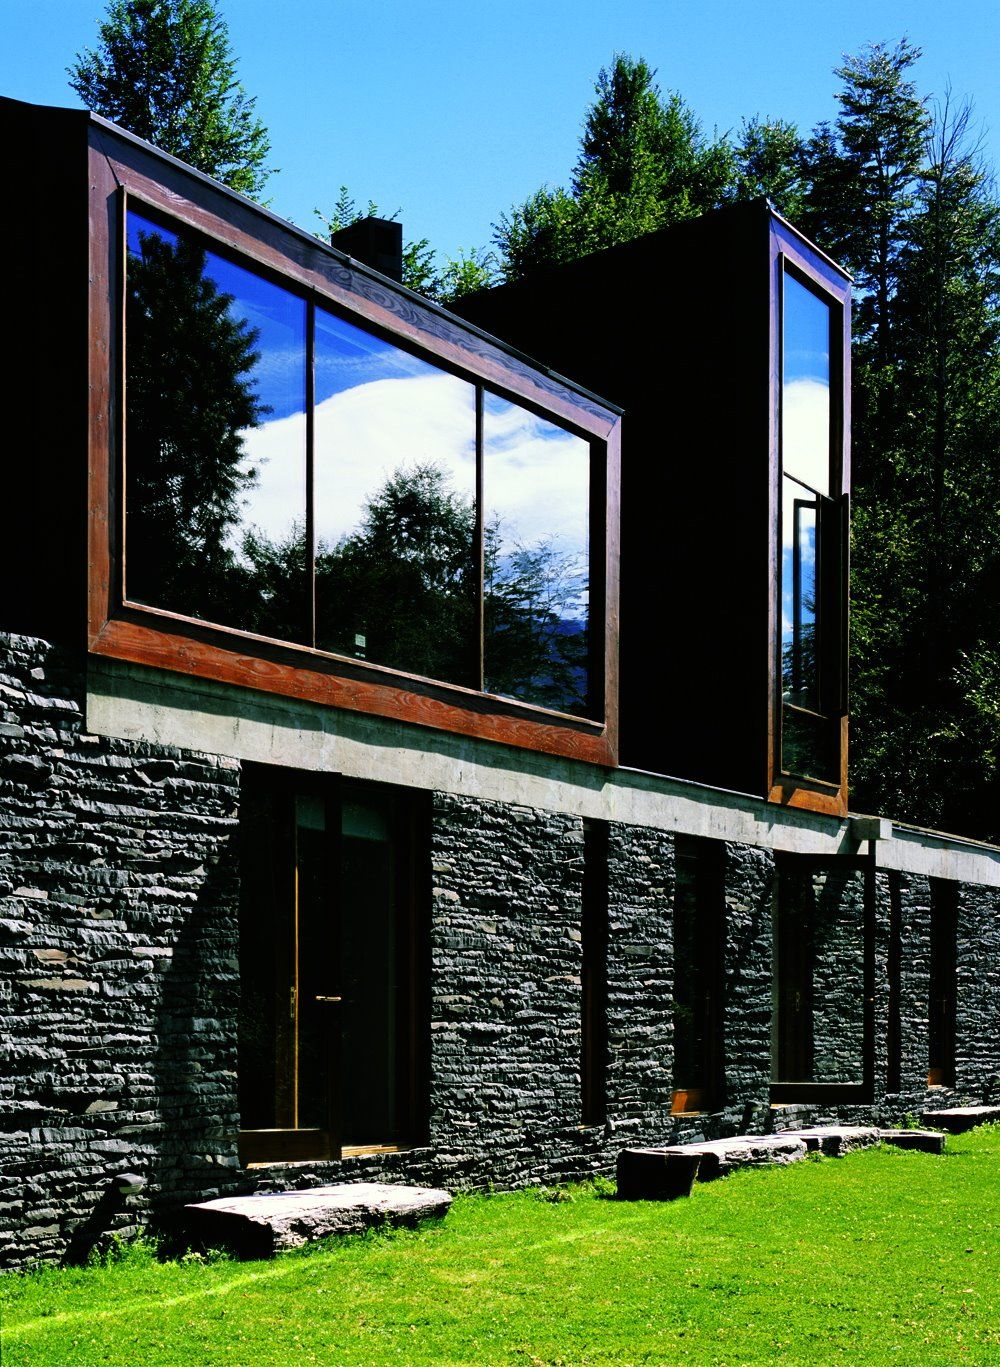 Casa Lago Pirehueico_ Alejandro Aravena_2003_santiago_Chile